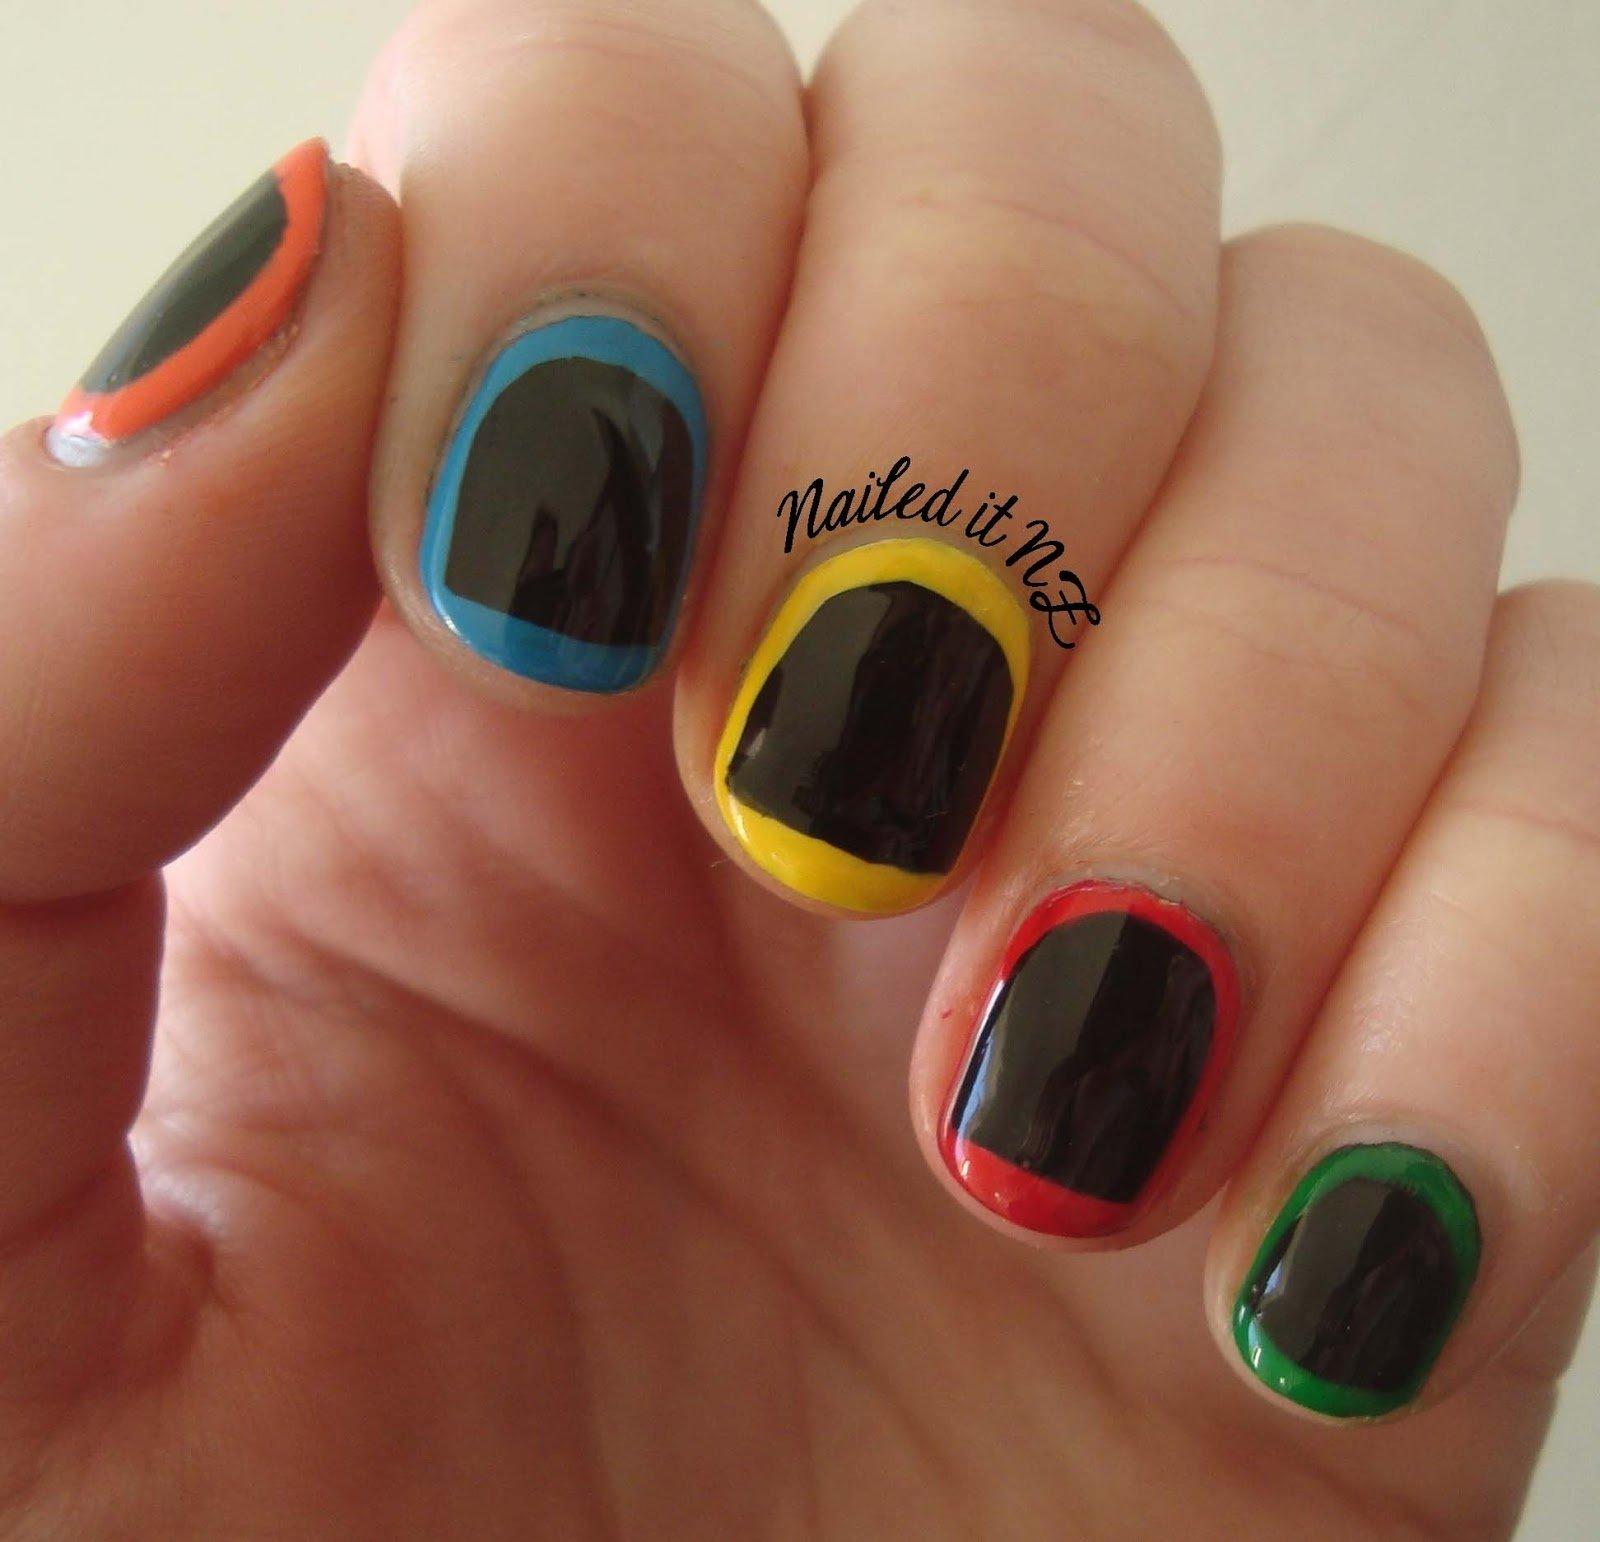 10 Attractive Easy Nail Ideas For Short Nails easynaildesignsforshortnails nail art for short nails 2 2021